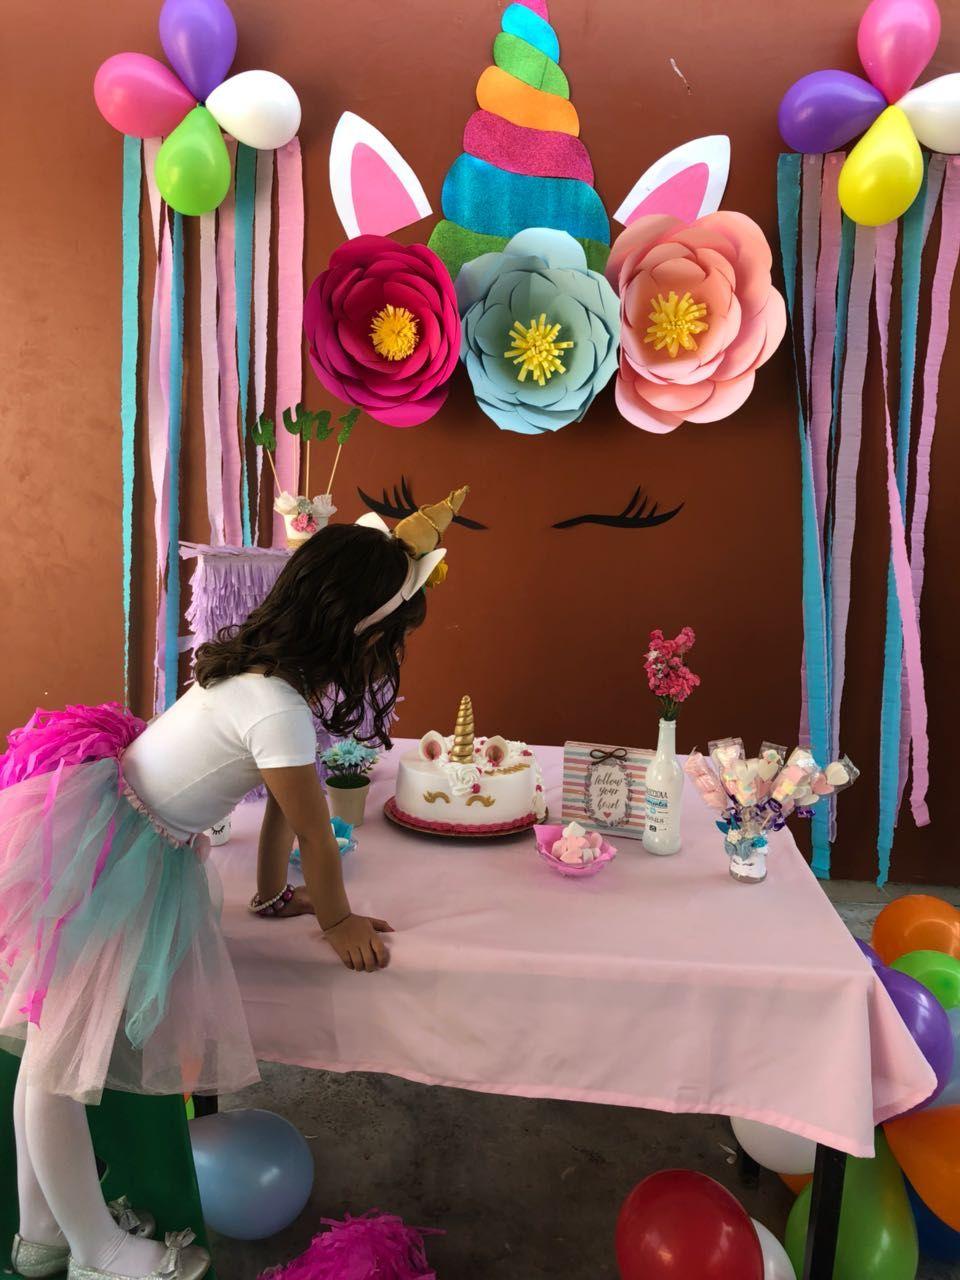 Pin By Lori Ann Vega On Party City Birthday Party Favors Unicorn Birthday Parties Birthday Parties